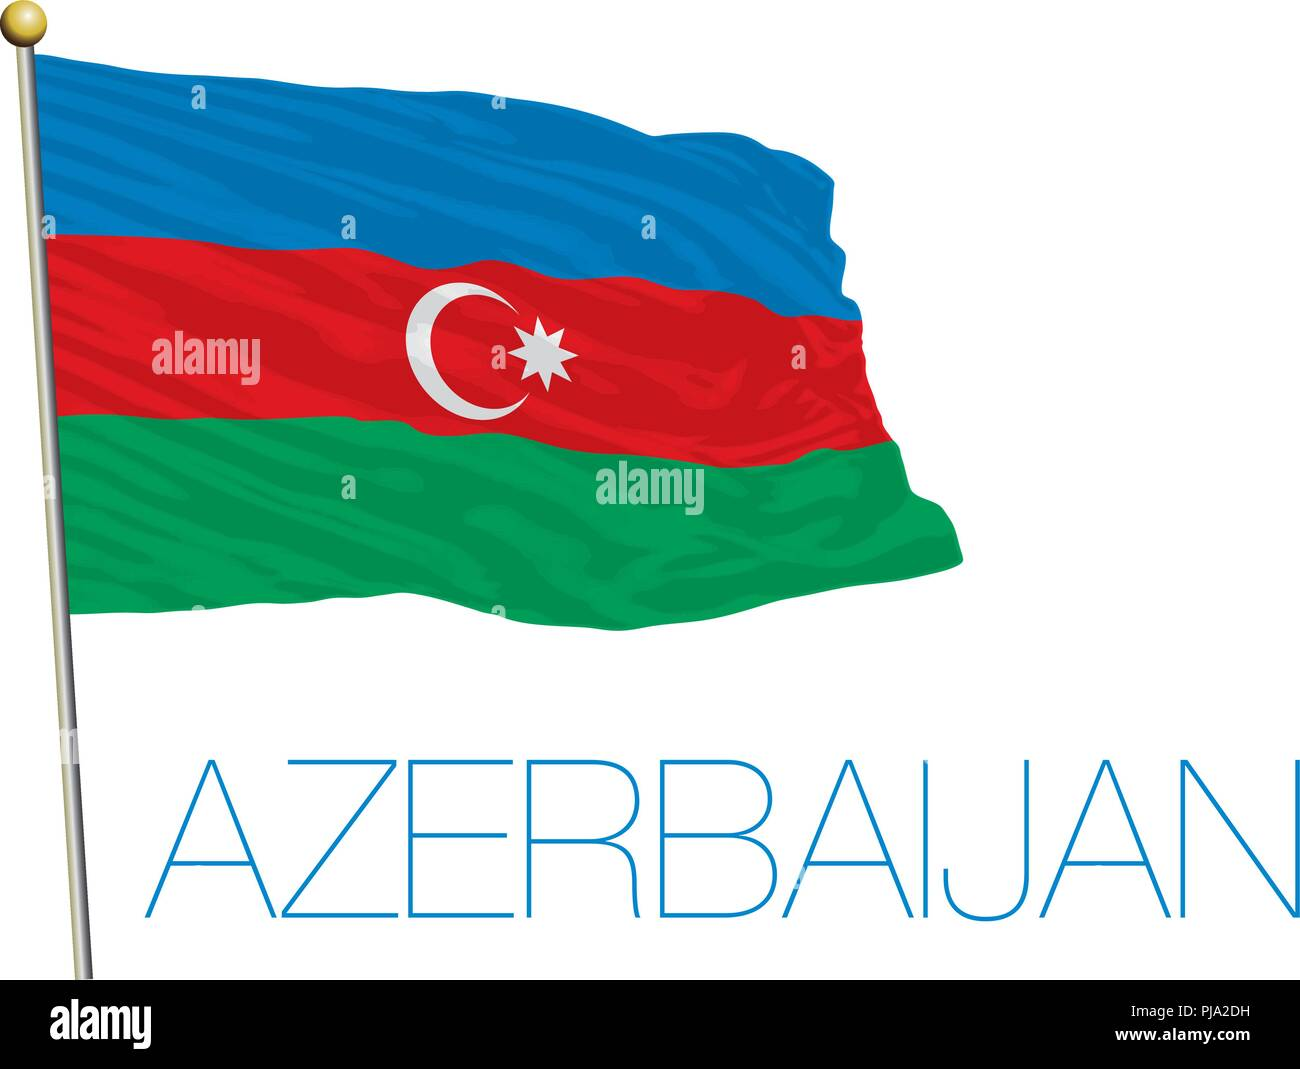 Azerbaijan flag and colors, vector illustration - Stock Vector